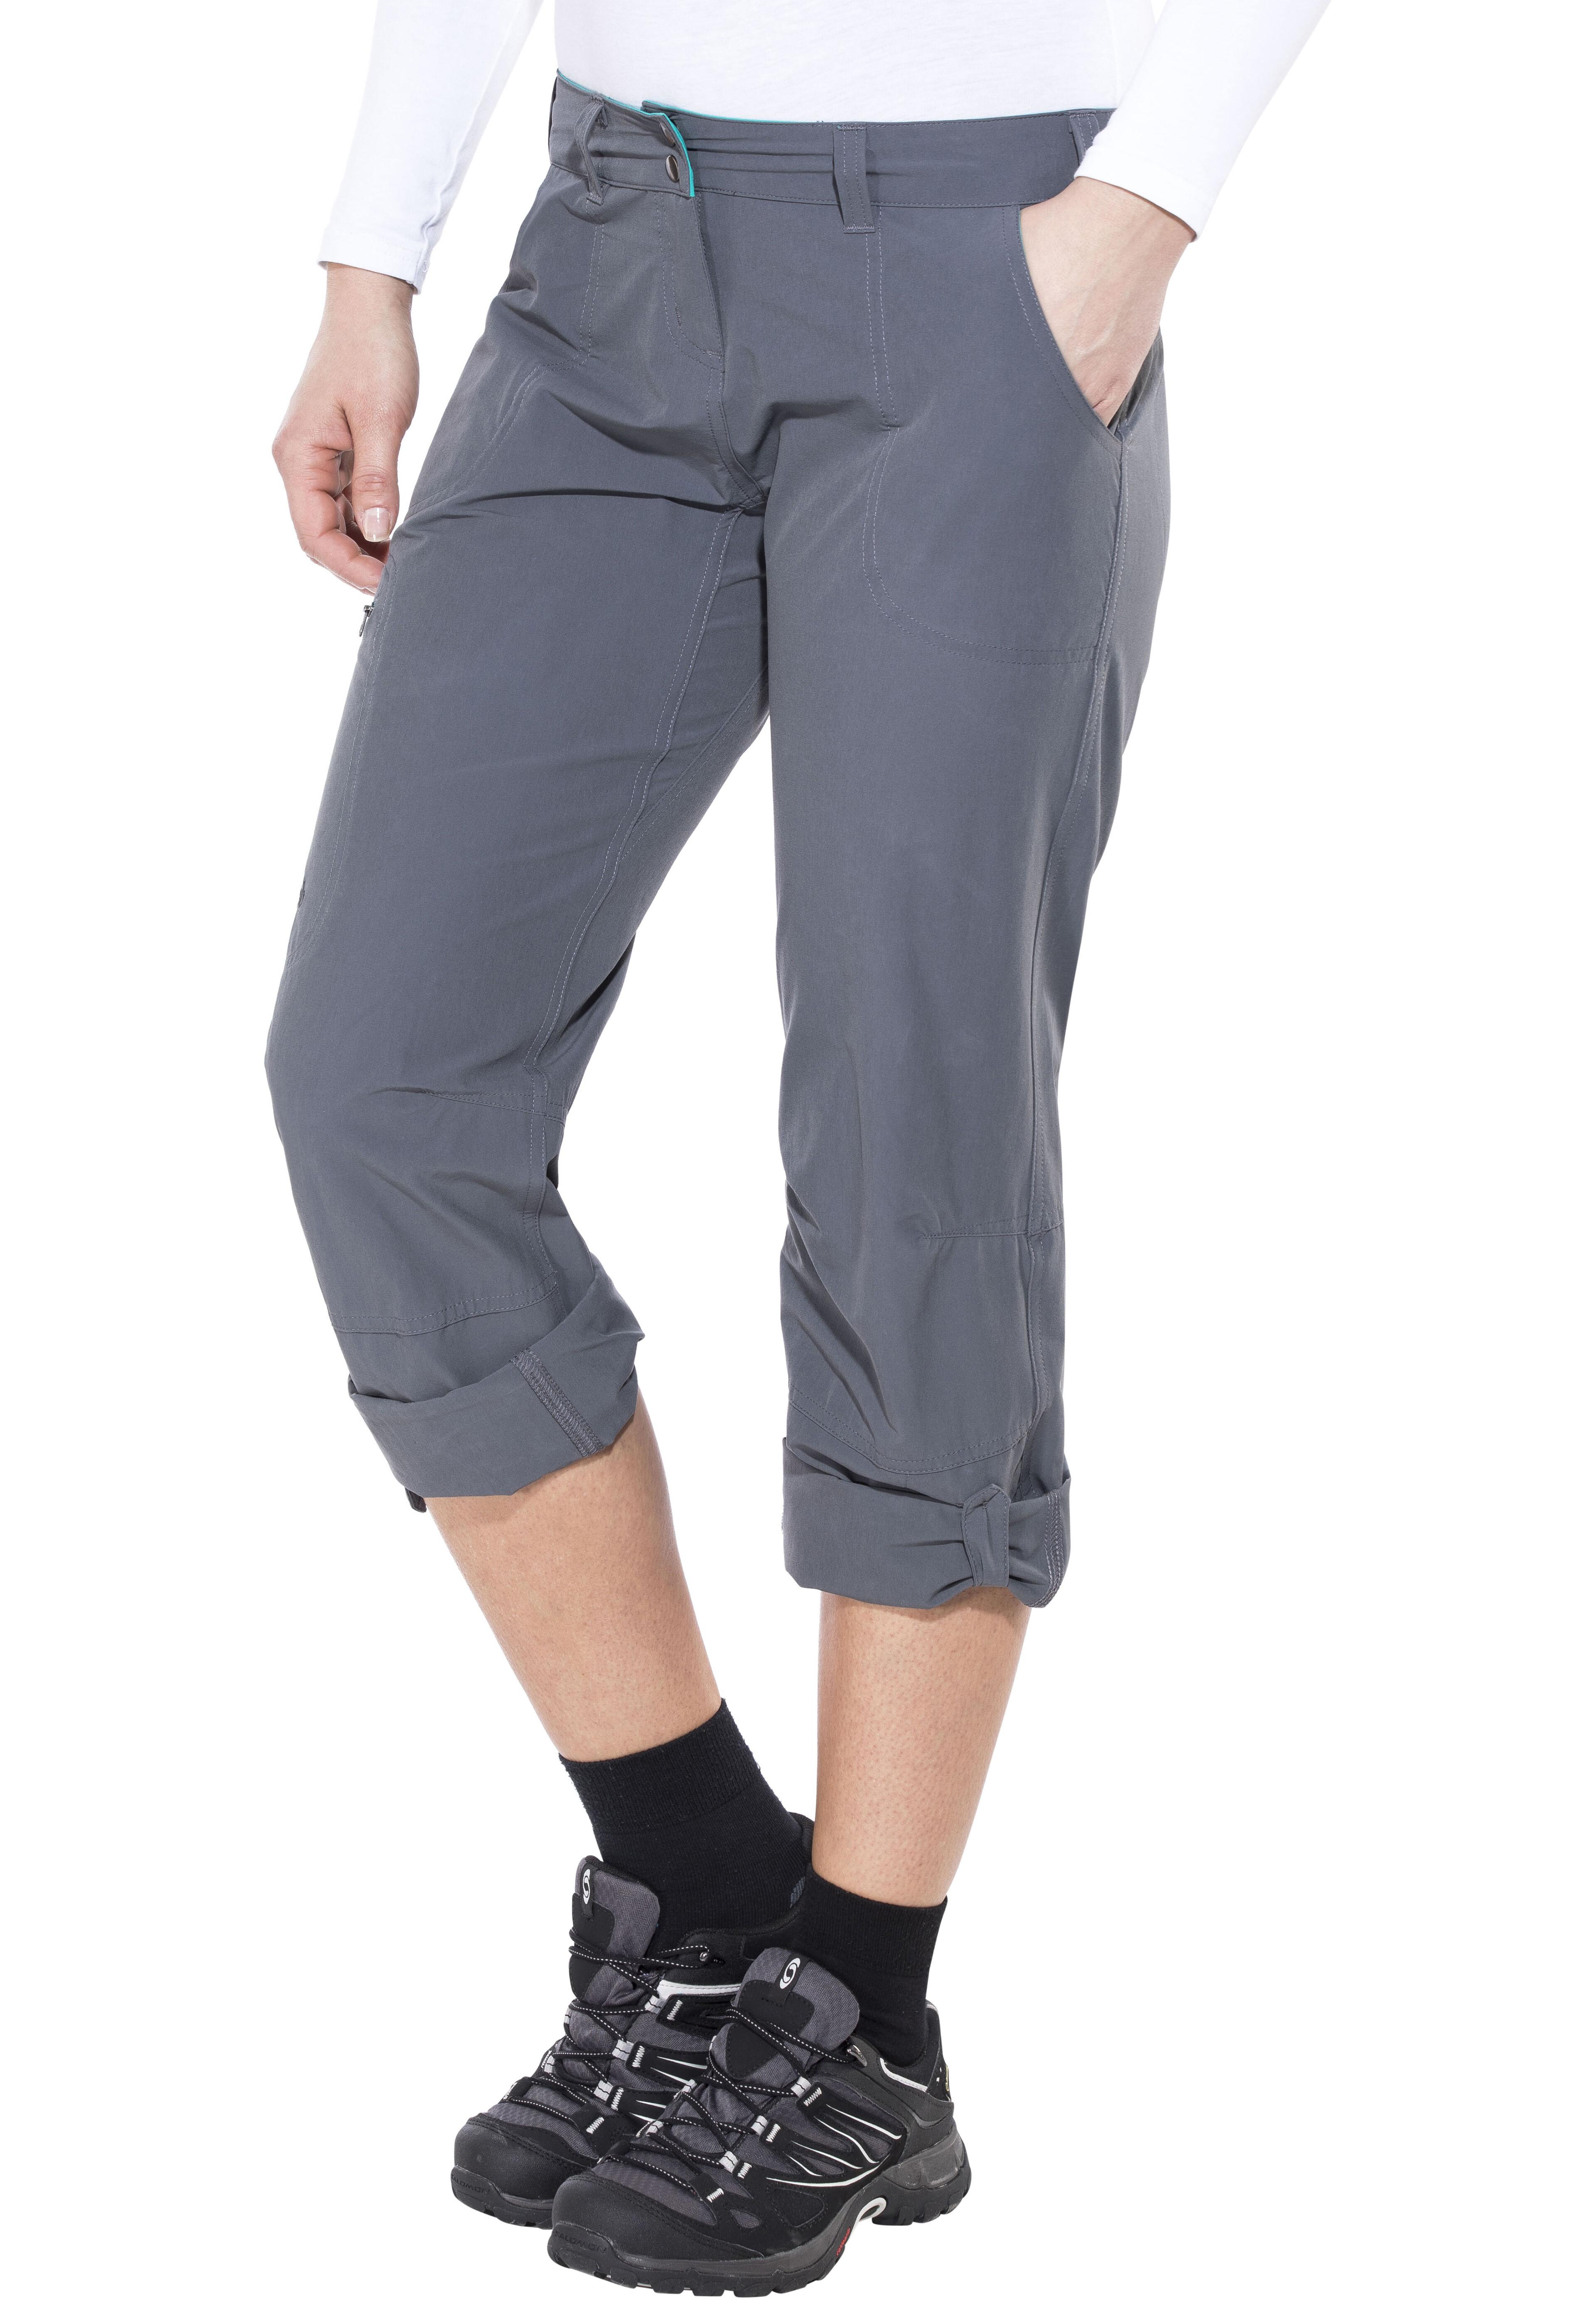 62129b712c9 Rab Helix Pants Women grey at Addnature.co.uk